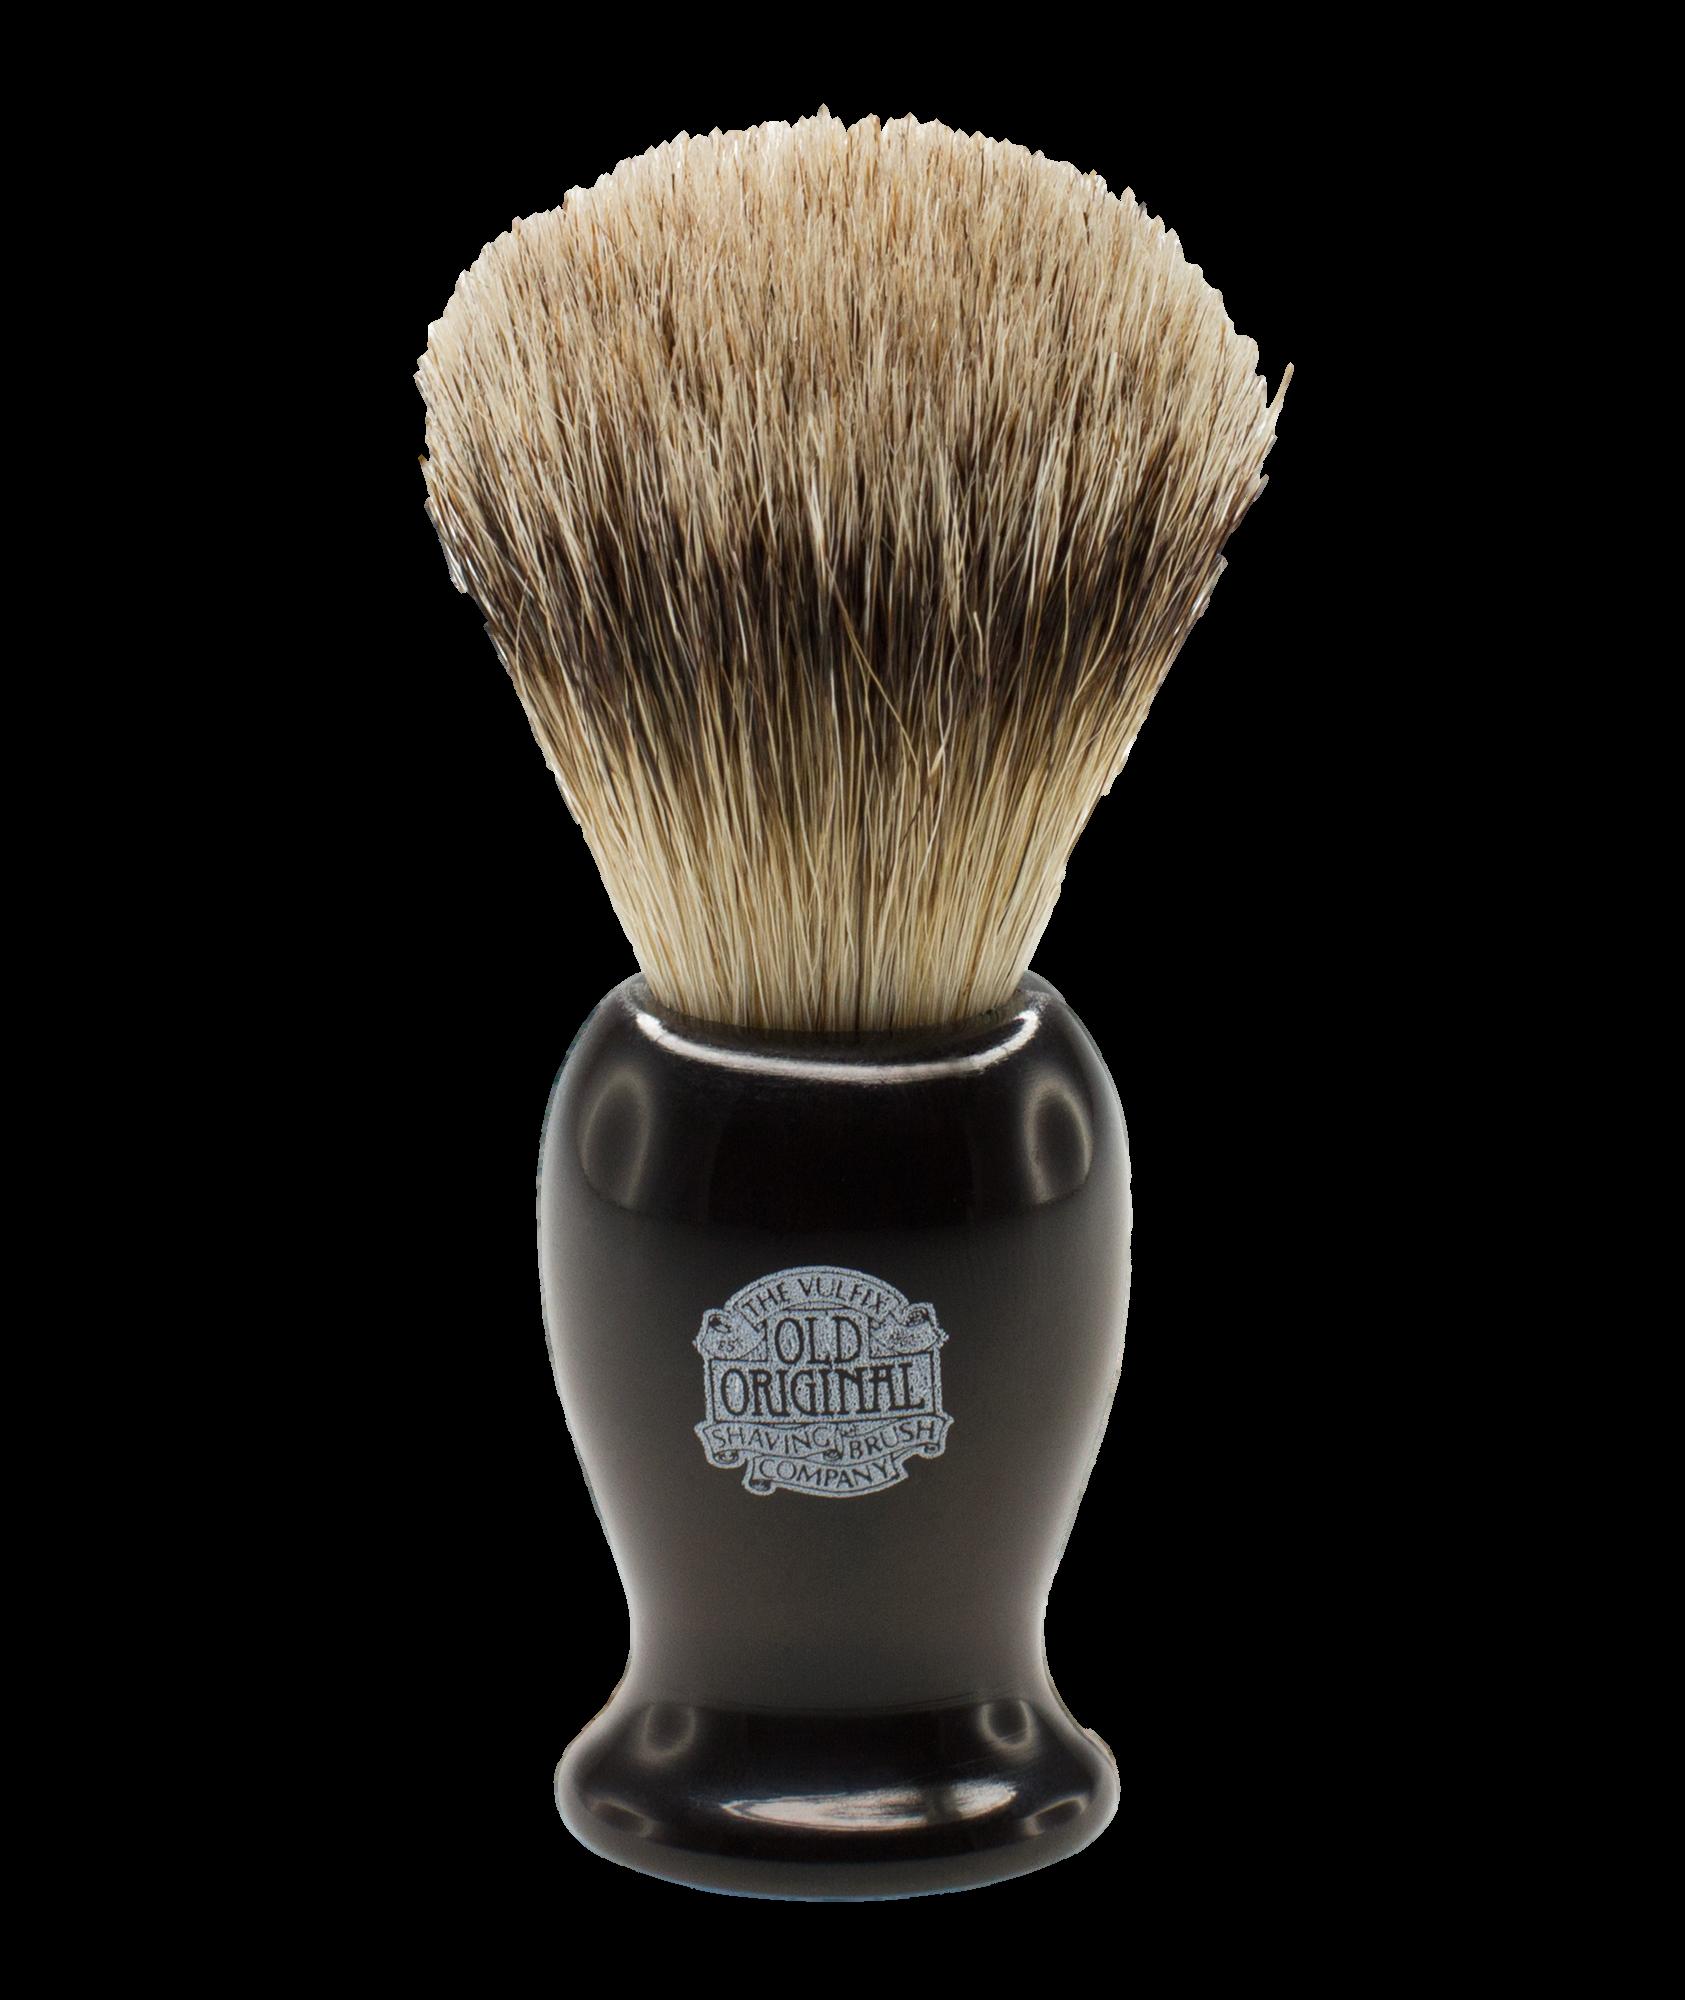 Progress Vulfix Super Badger Shaving Brush, Medium Black Handle